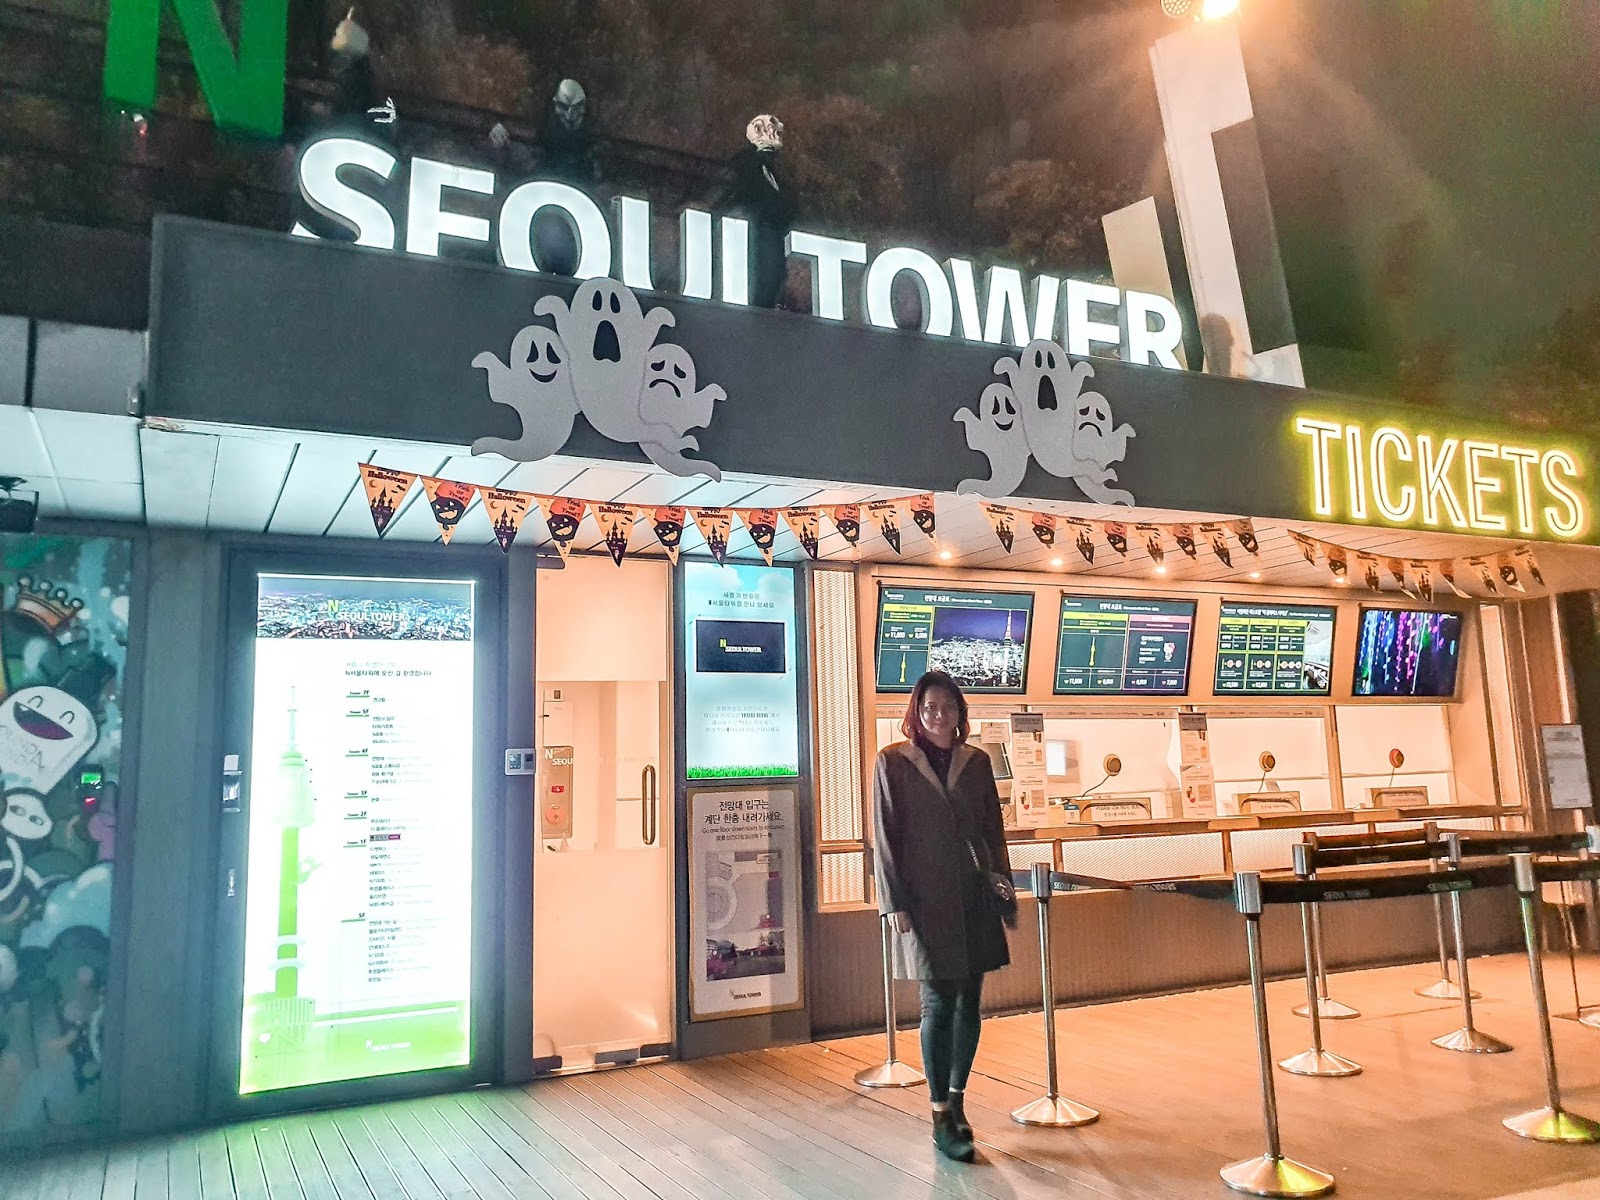 travel guide in South Korea, Asia, KKdayPH, thedailyposh in South Korea, Seoul, South Korea, Travel, TravelwithKKday, what to do in South Korea,